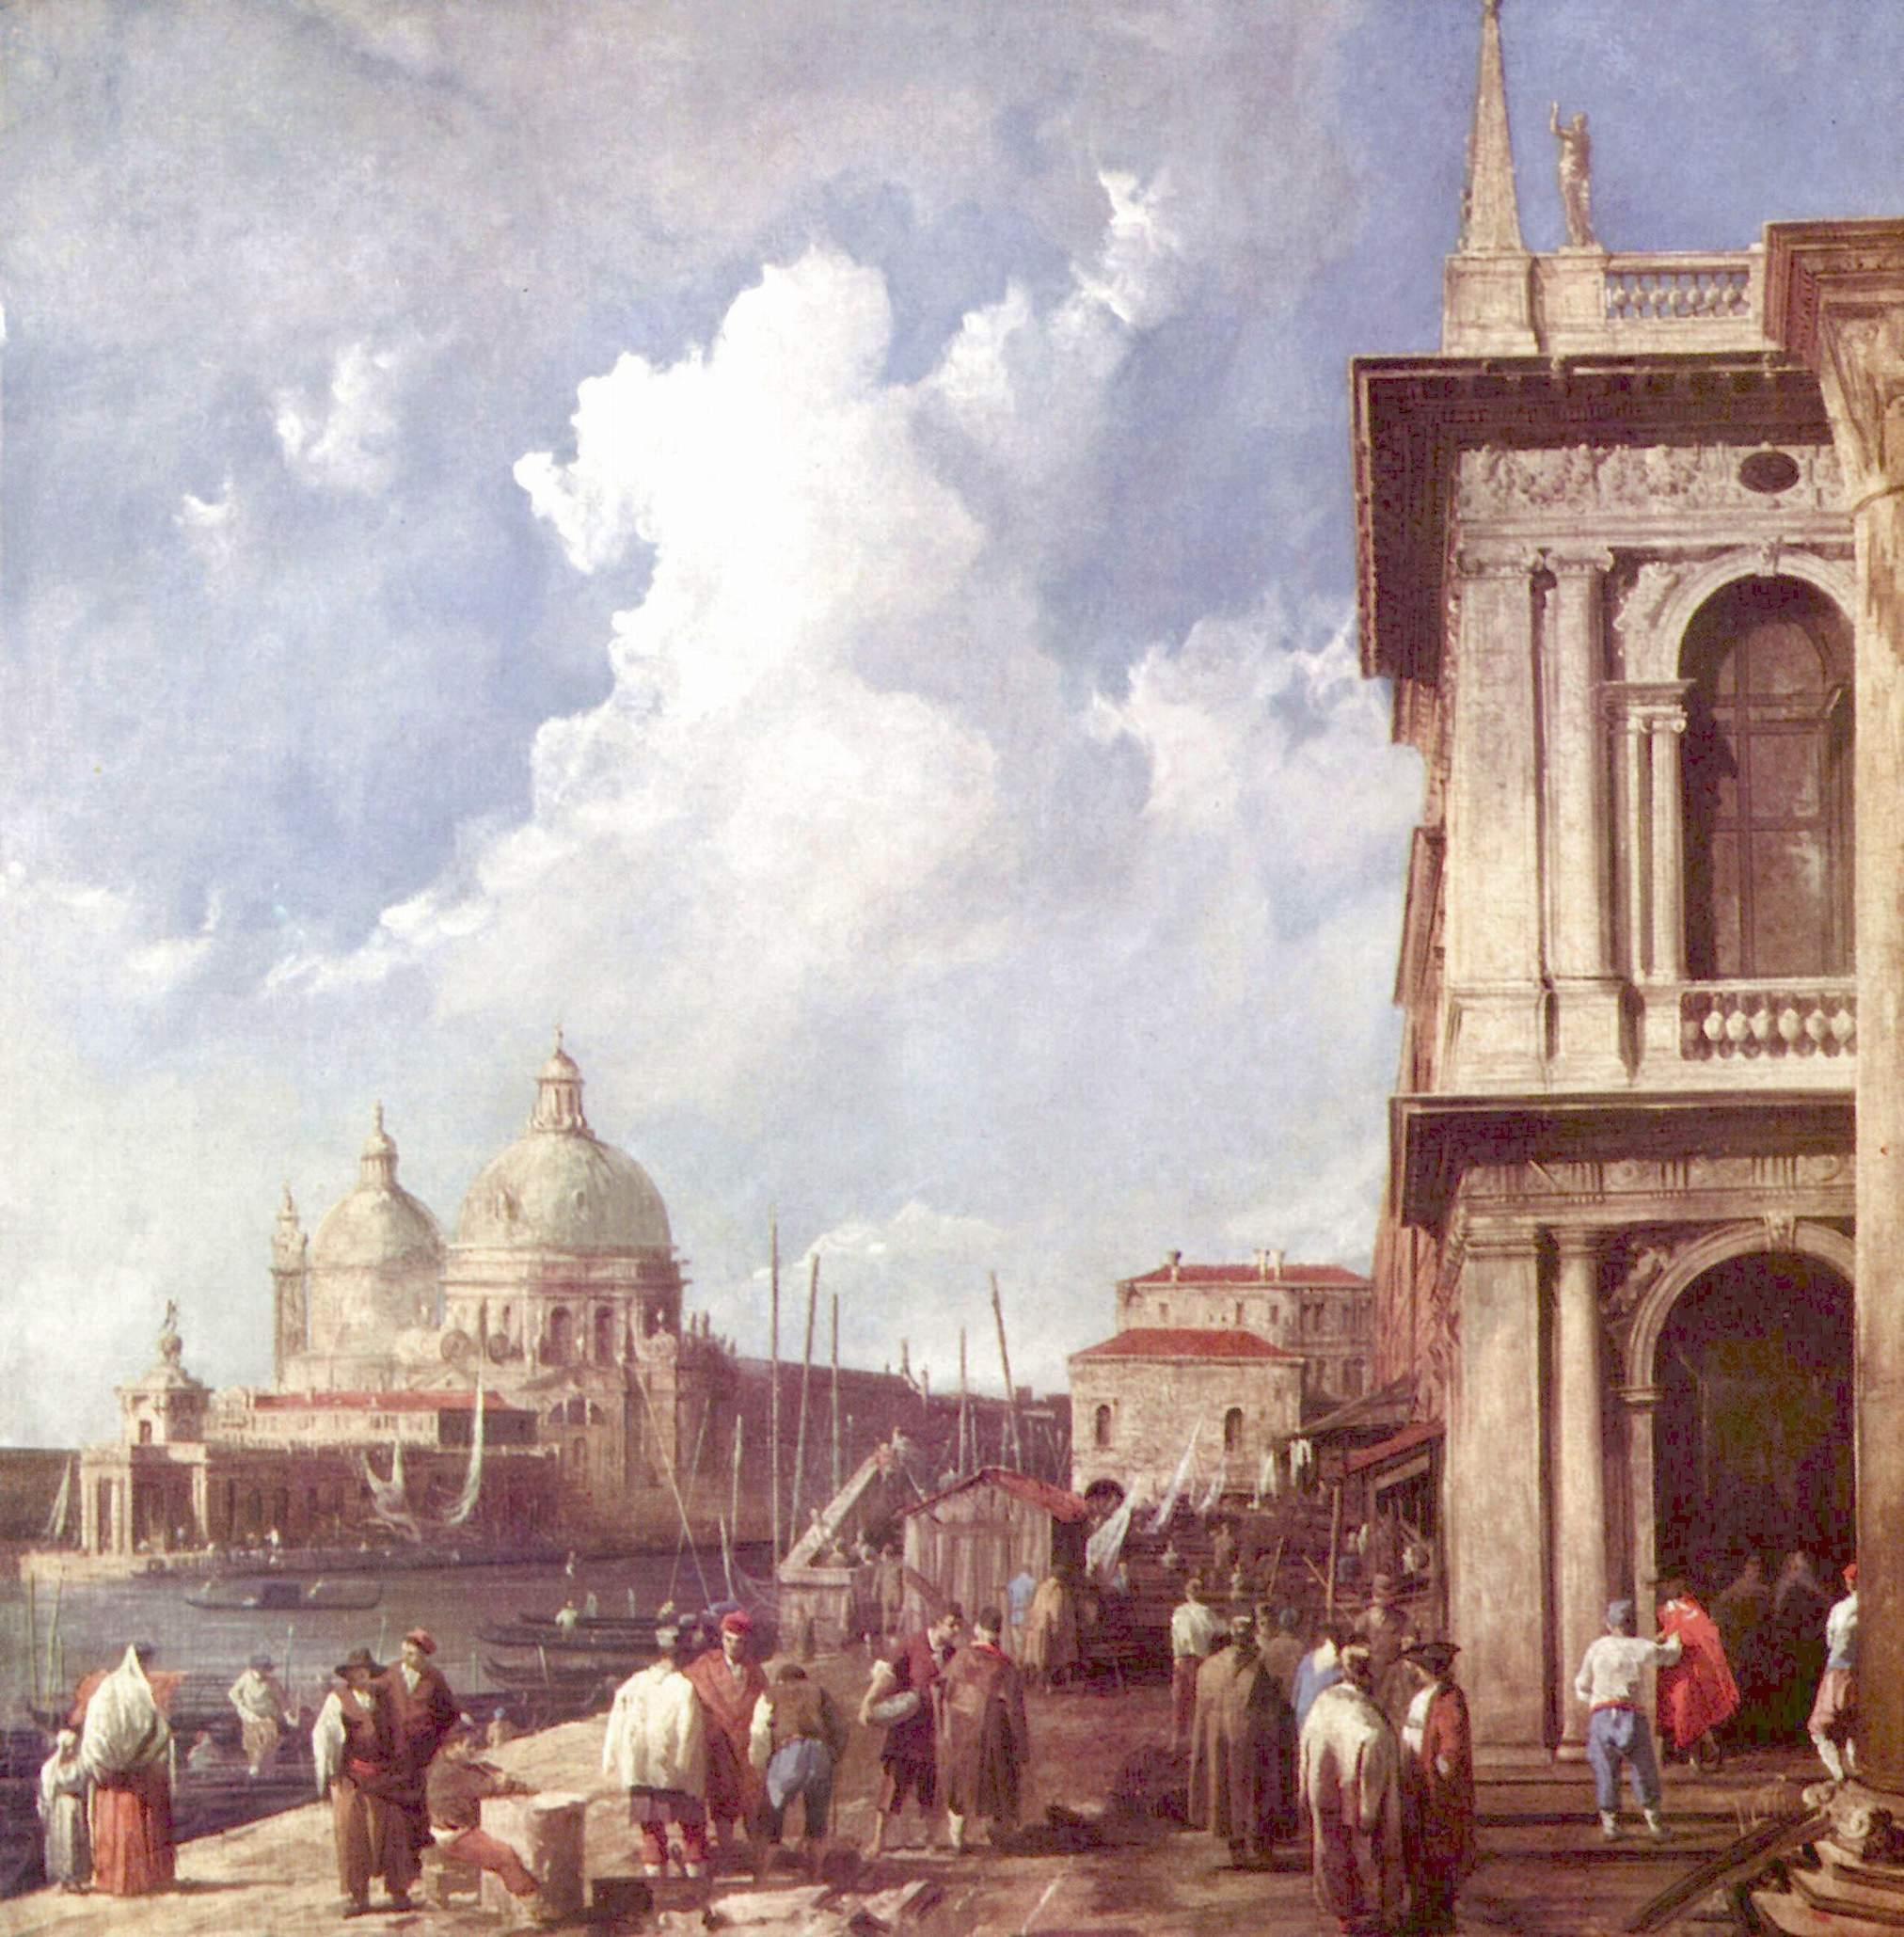 http://upload.wikimedia.org/wikipedia/commons/2/20/Canaletto_%28II%29_025.jpg